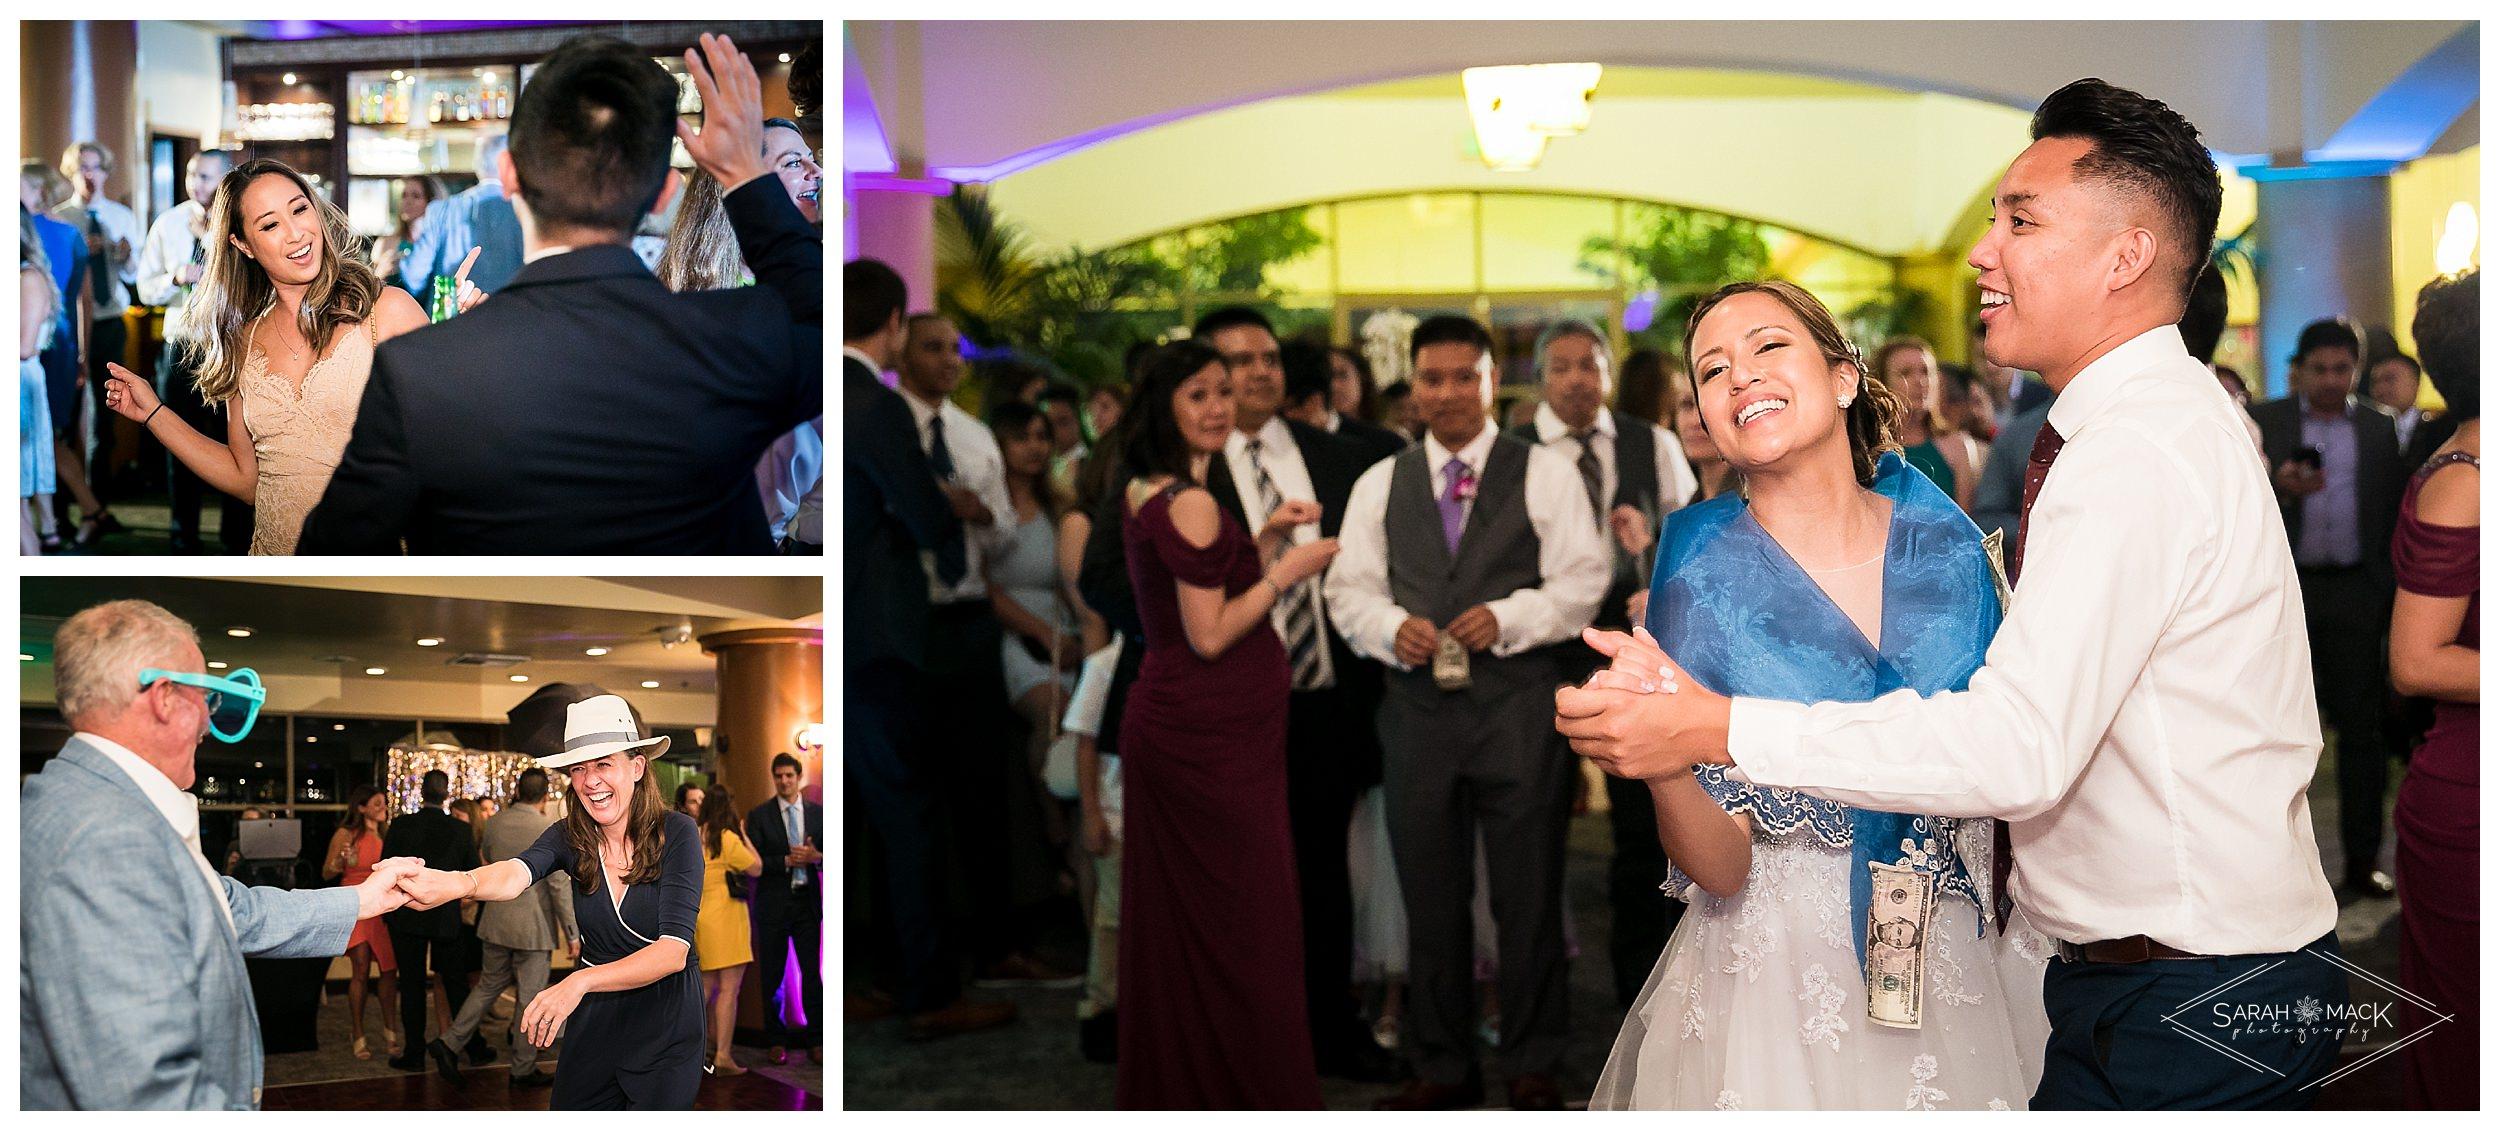 MR-Sea-Cliffe-Country-Club-Huntington-Beach-Wedding-0185.jpg